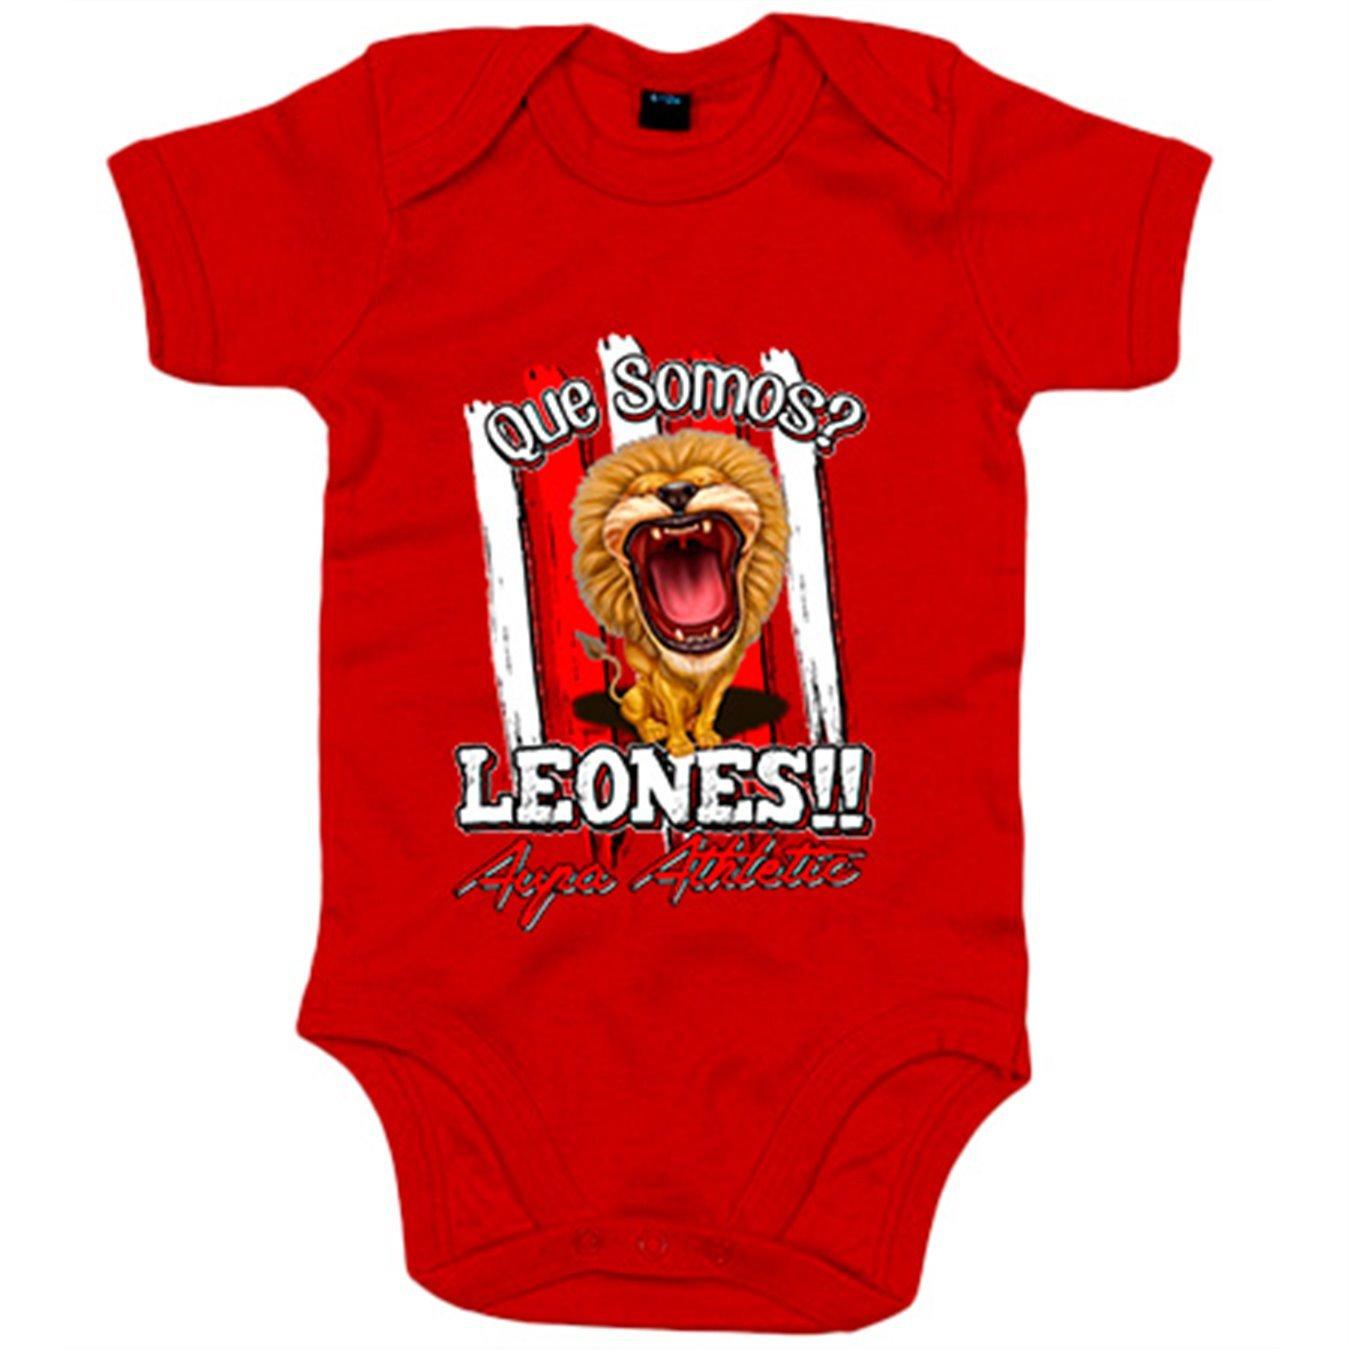 Body bebé qué somos Leones Aupa Athletic fútbol Bilbao - Blanco 9a0123b80b5b6